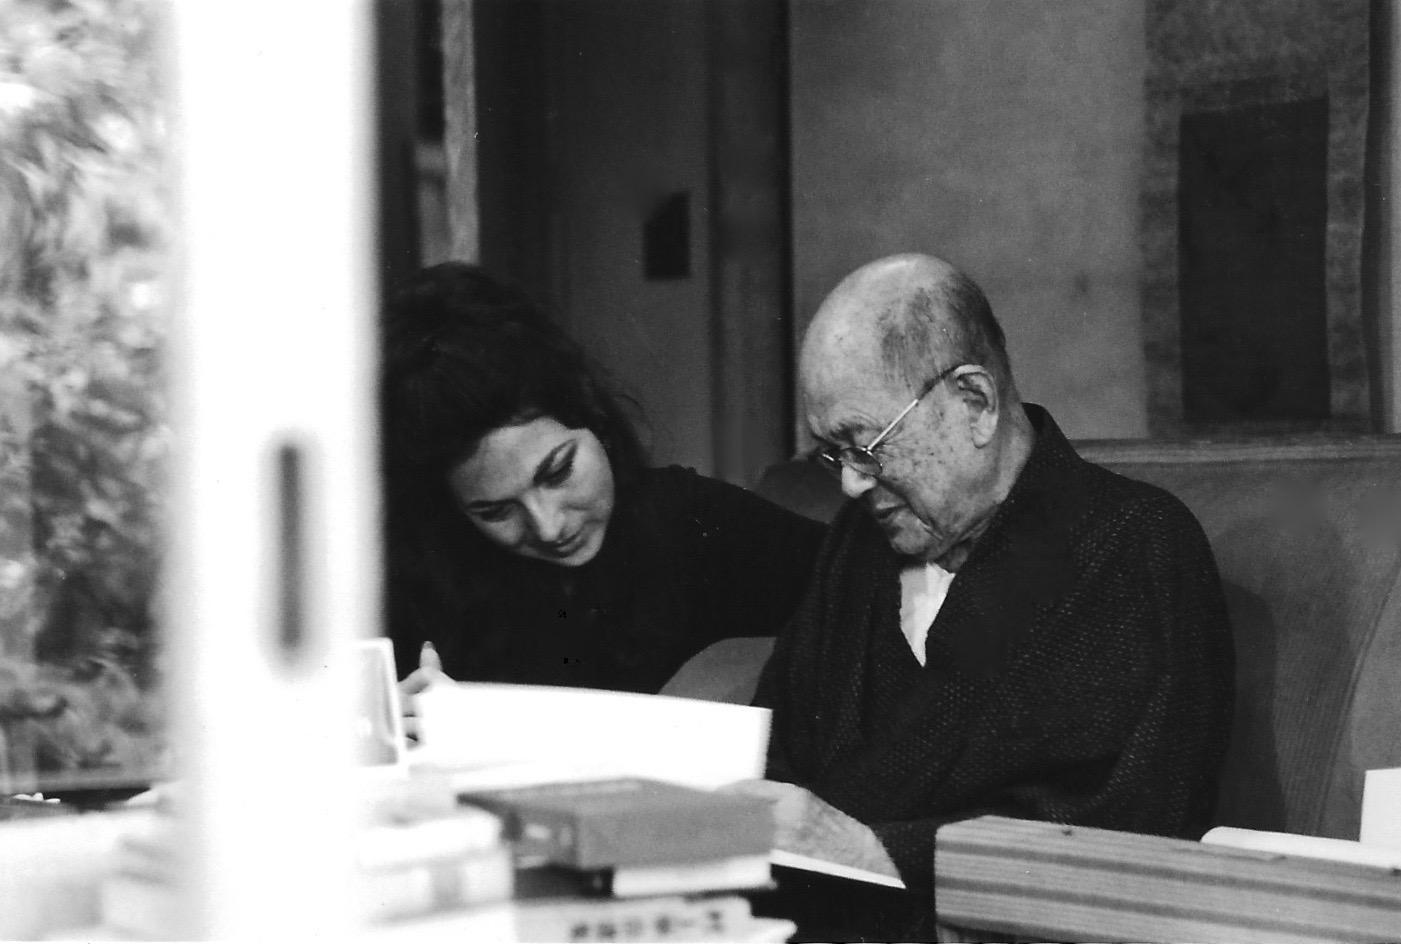 Japan 1970 - Sara Larkin and Author Mushanokoji at his residence